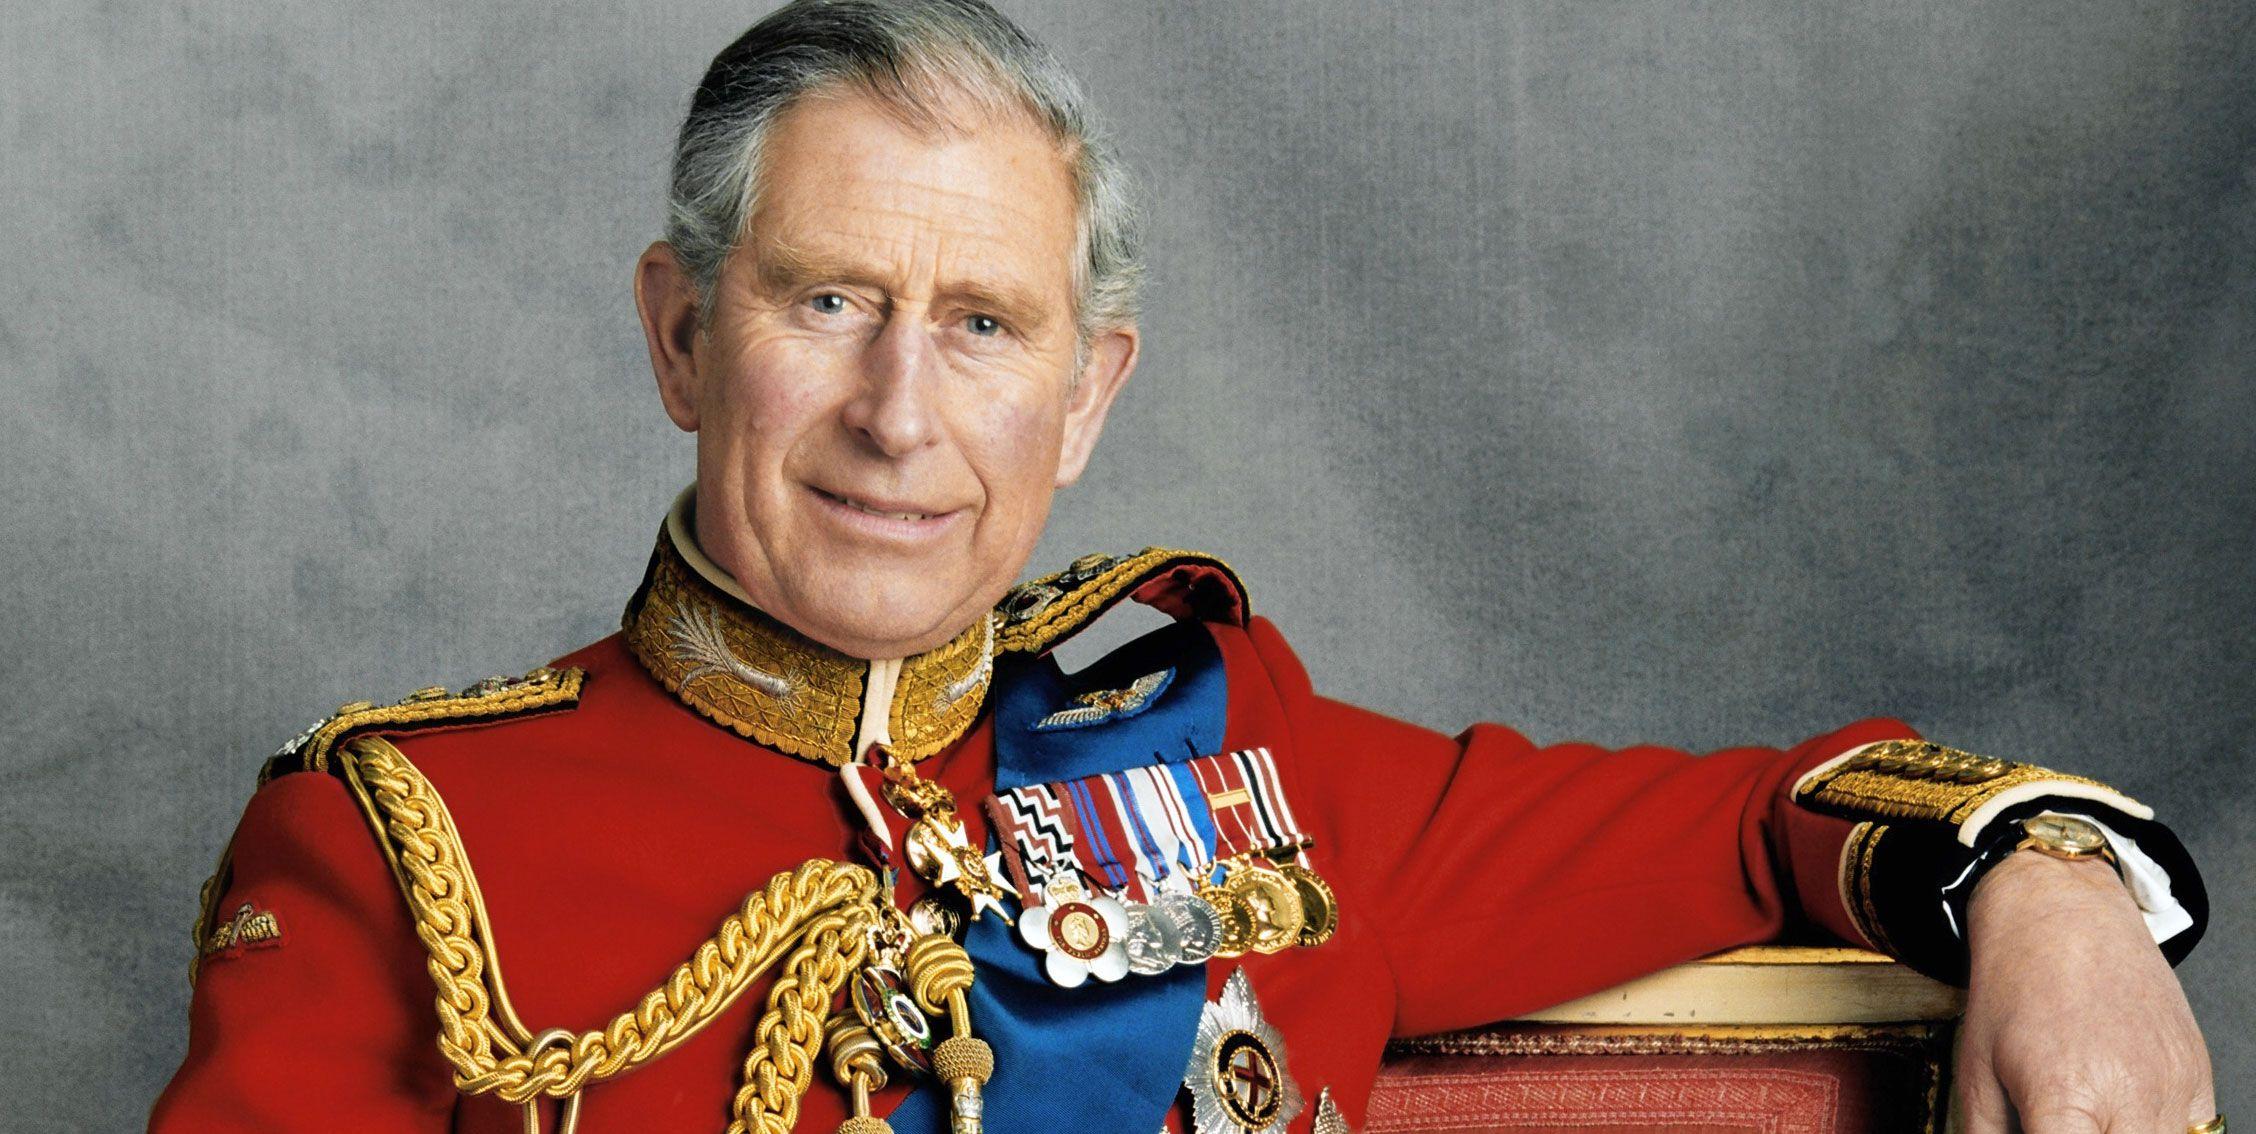 Prince Charles 60th birthday portrait